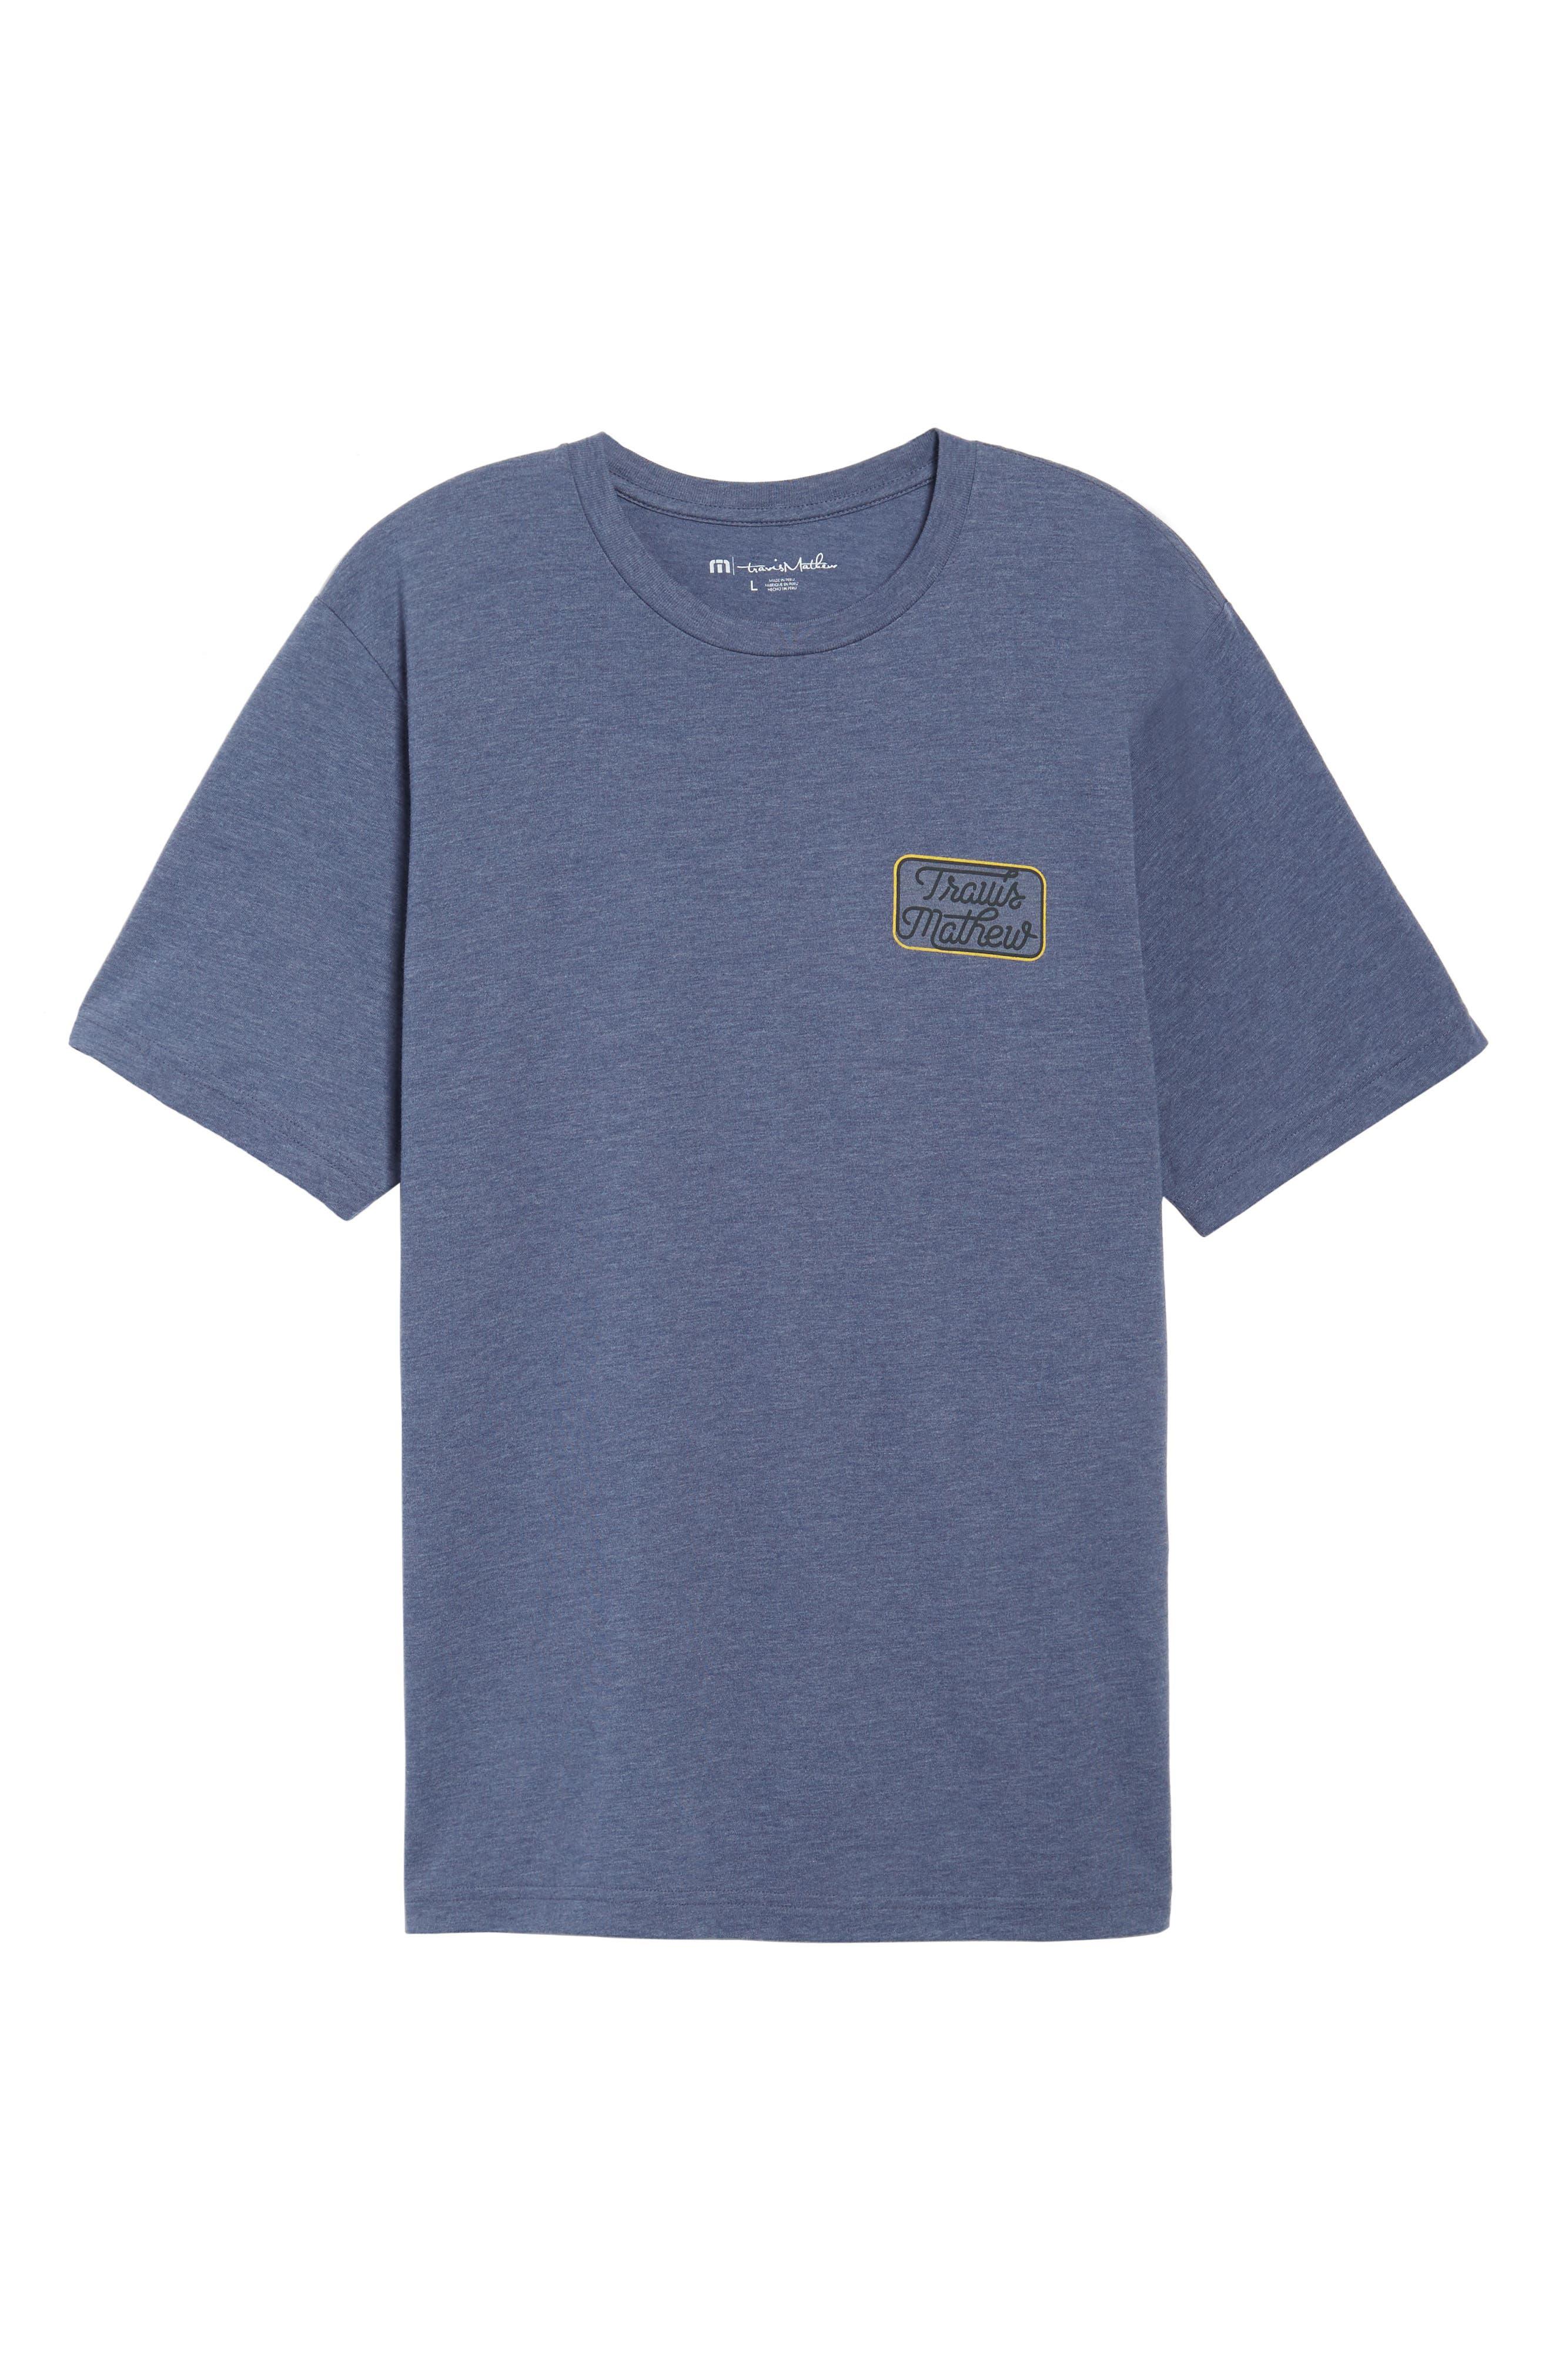 TRAVIS MATHEW,                             Truck Stop Graphic T-Shirt,                             Alternate thumbnail 6, color,                             400